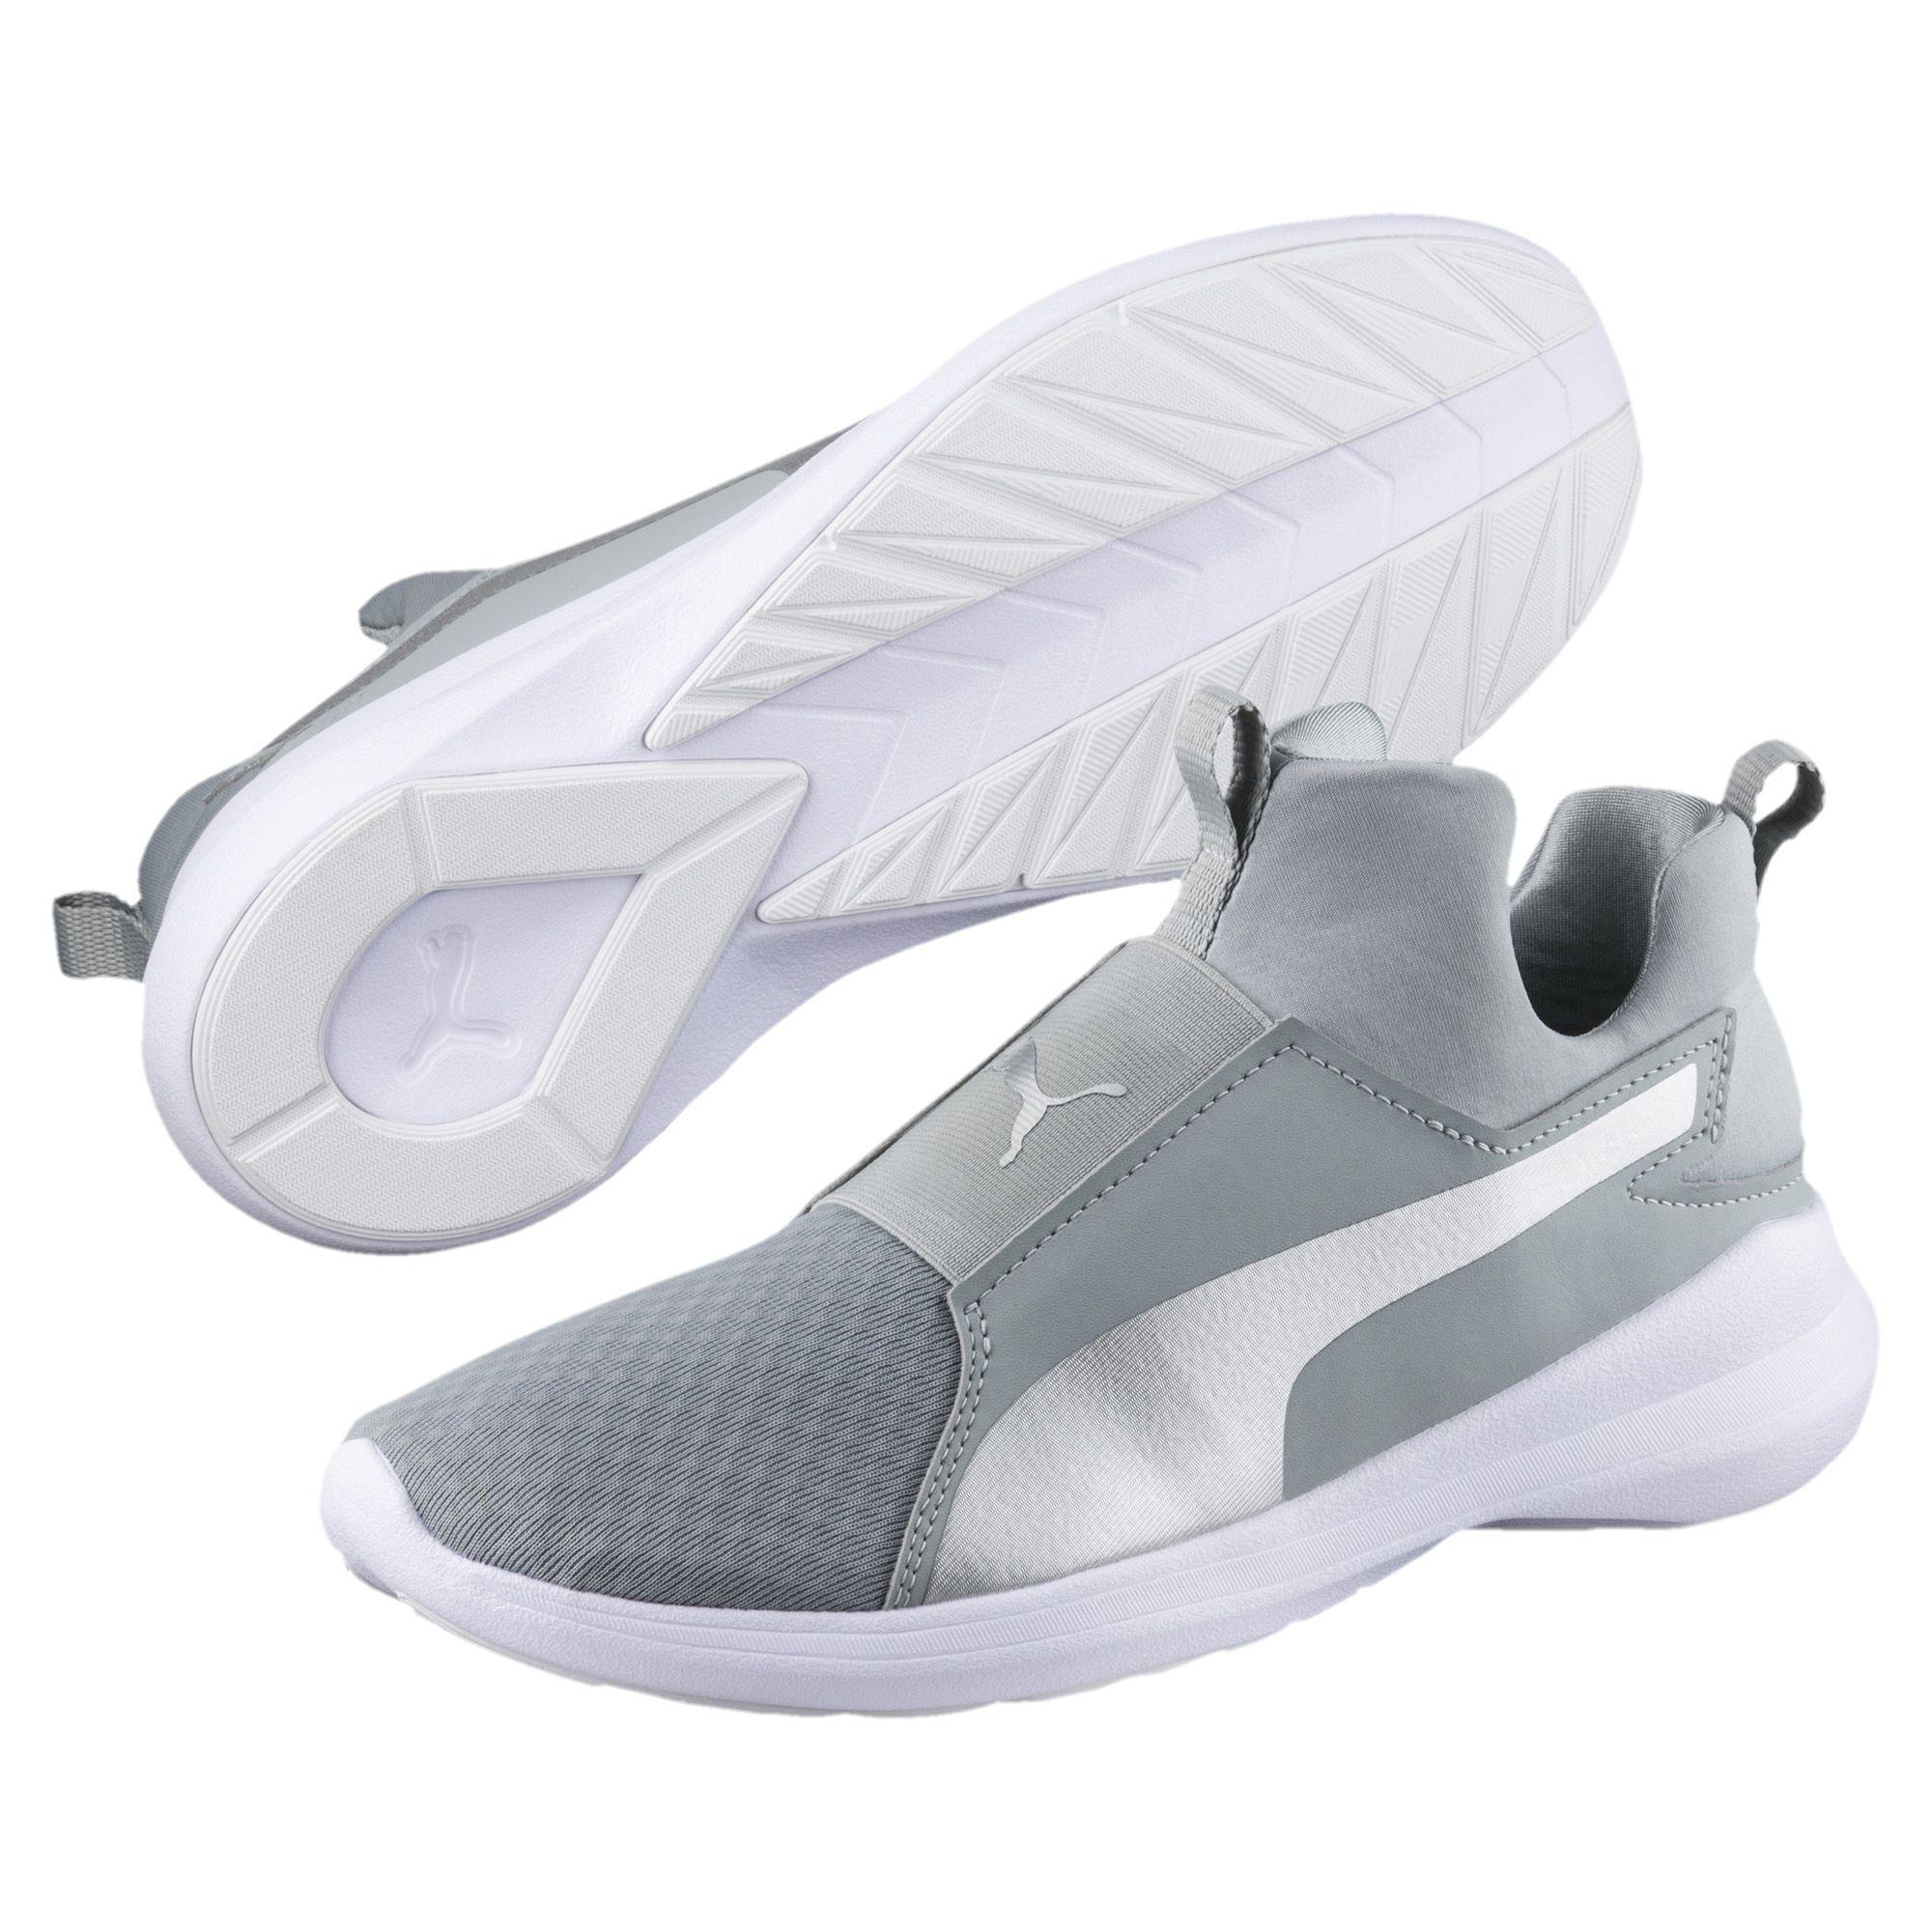 2be0c891abf6 Lyst - PUMA Rebel Mid Women s Training Shoes